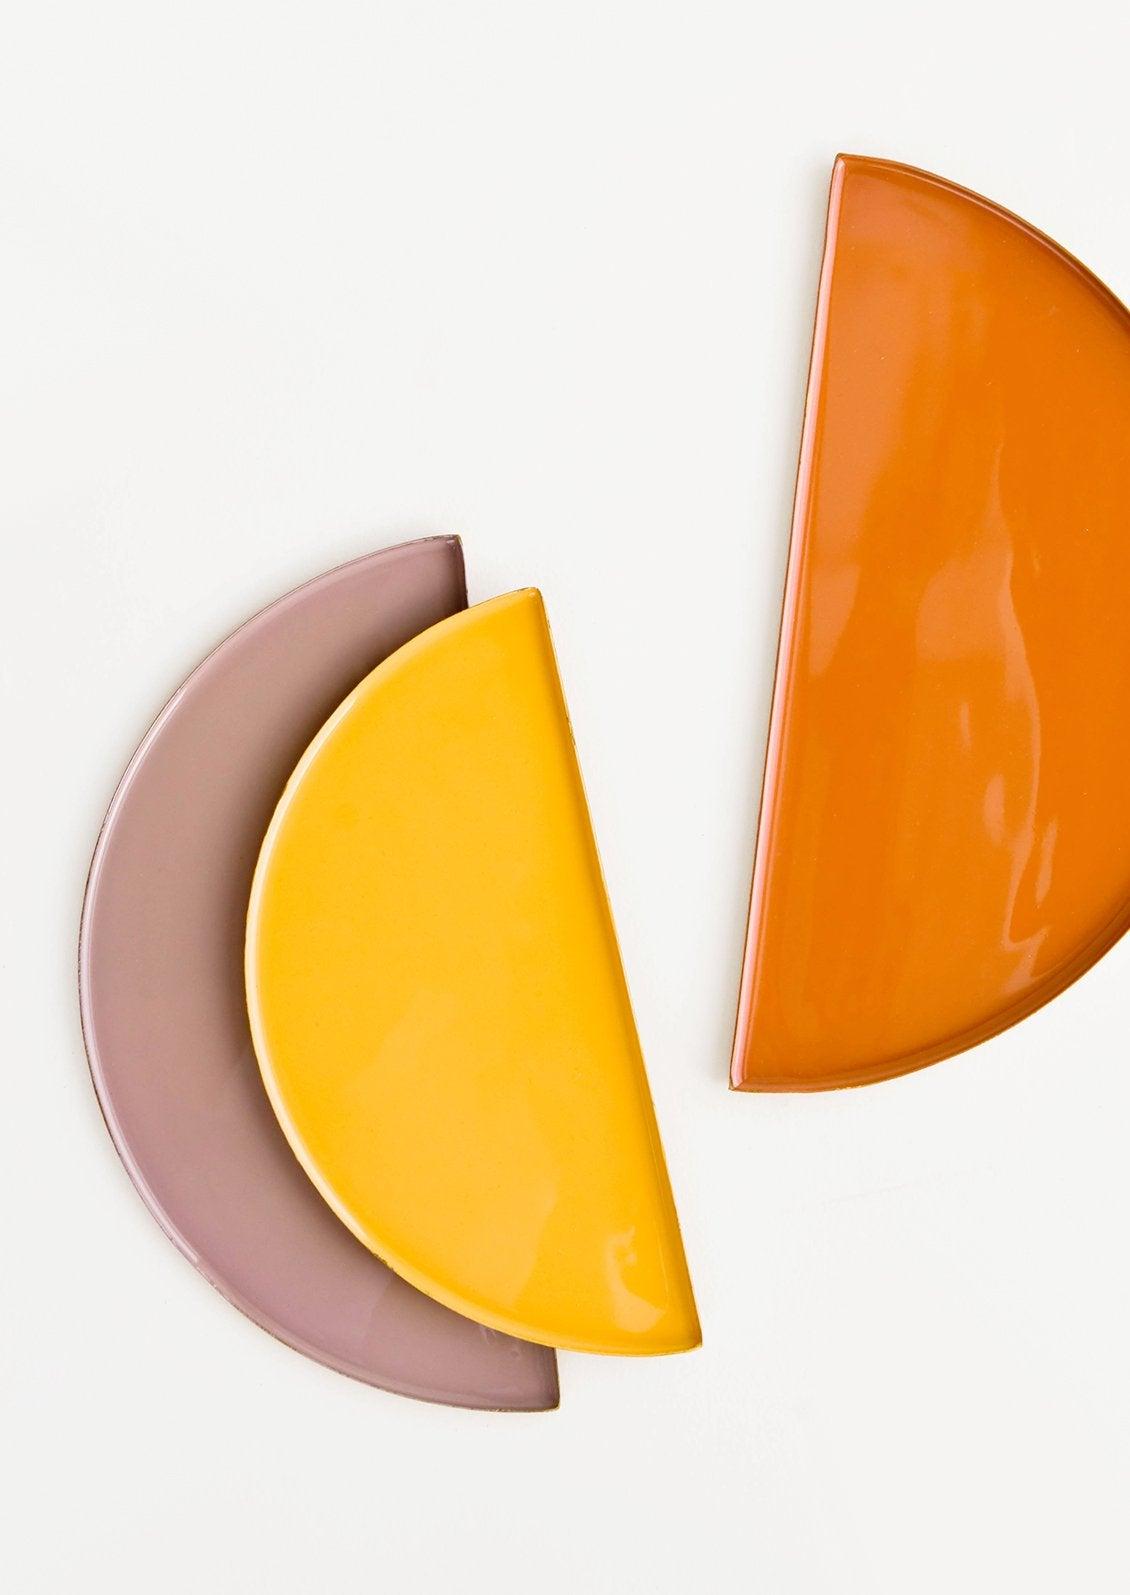 three catchall dishes in yellow, orange, and purple